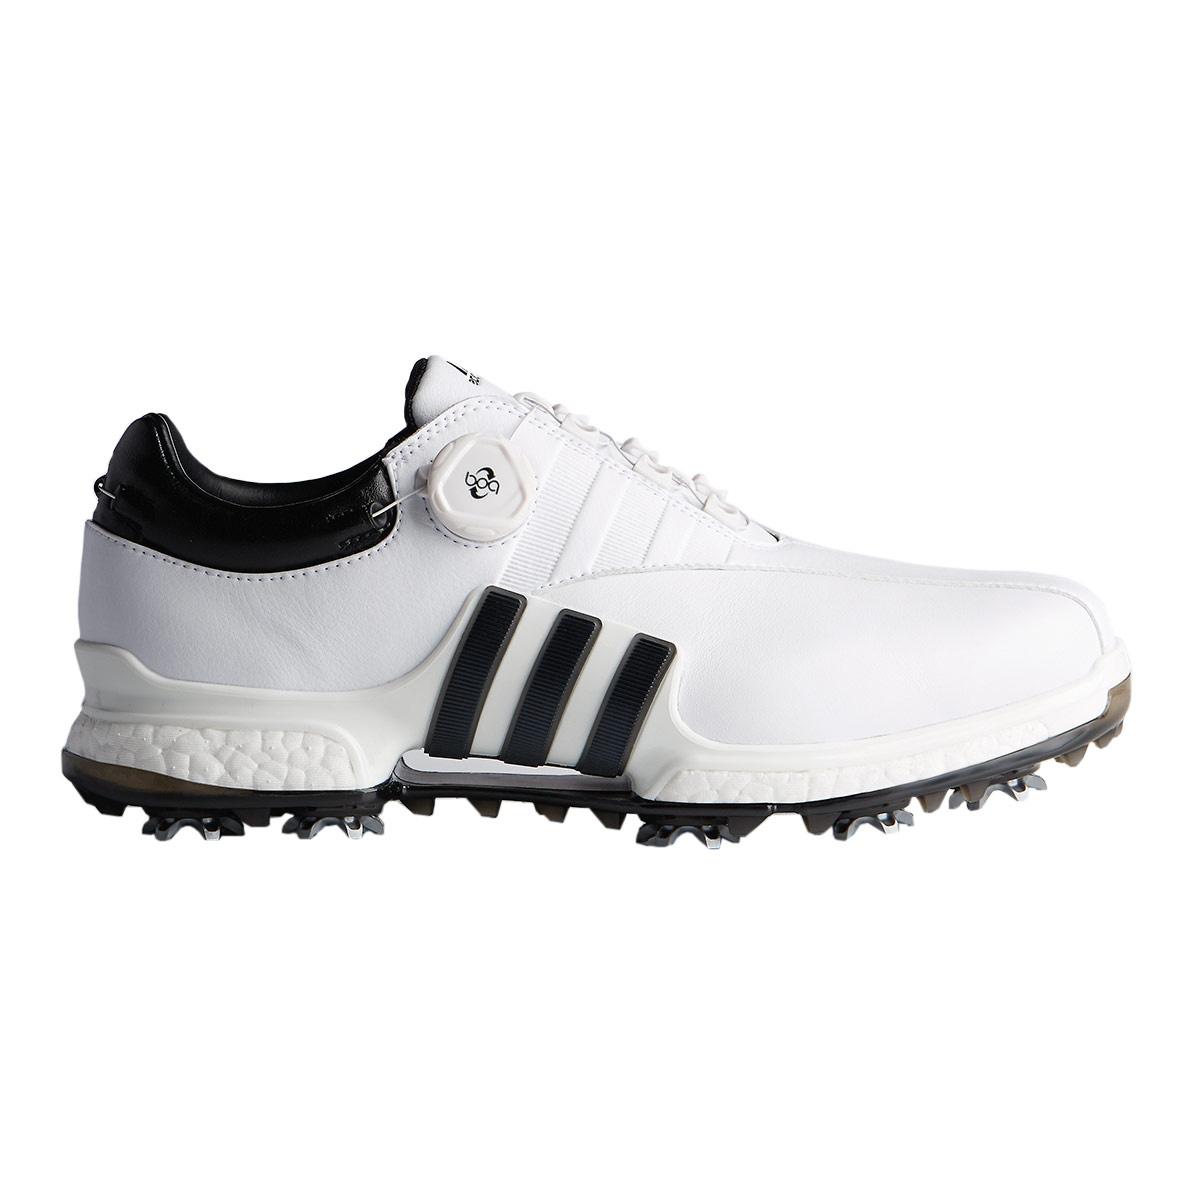 adidas boa golf shoes